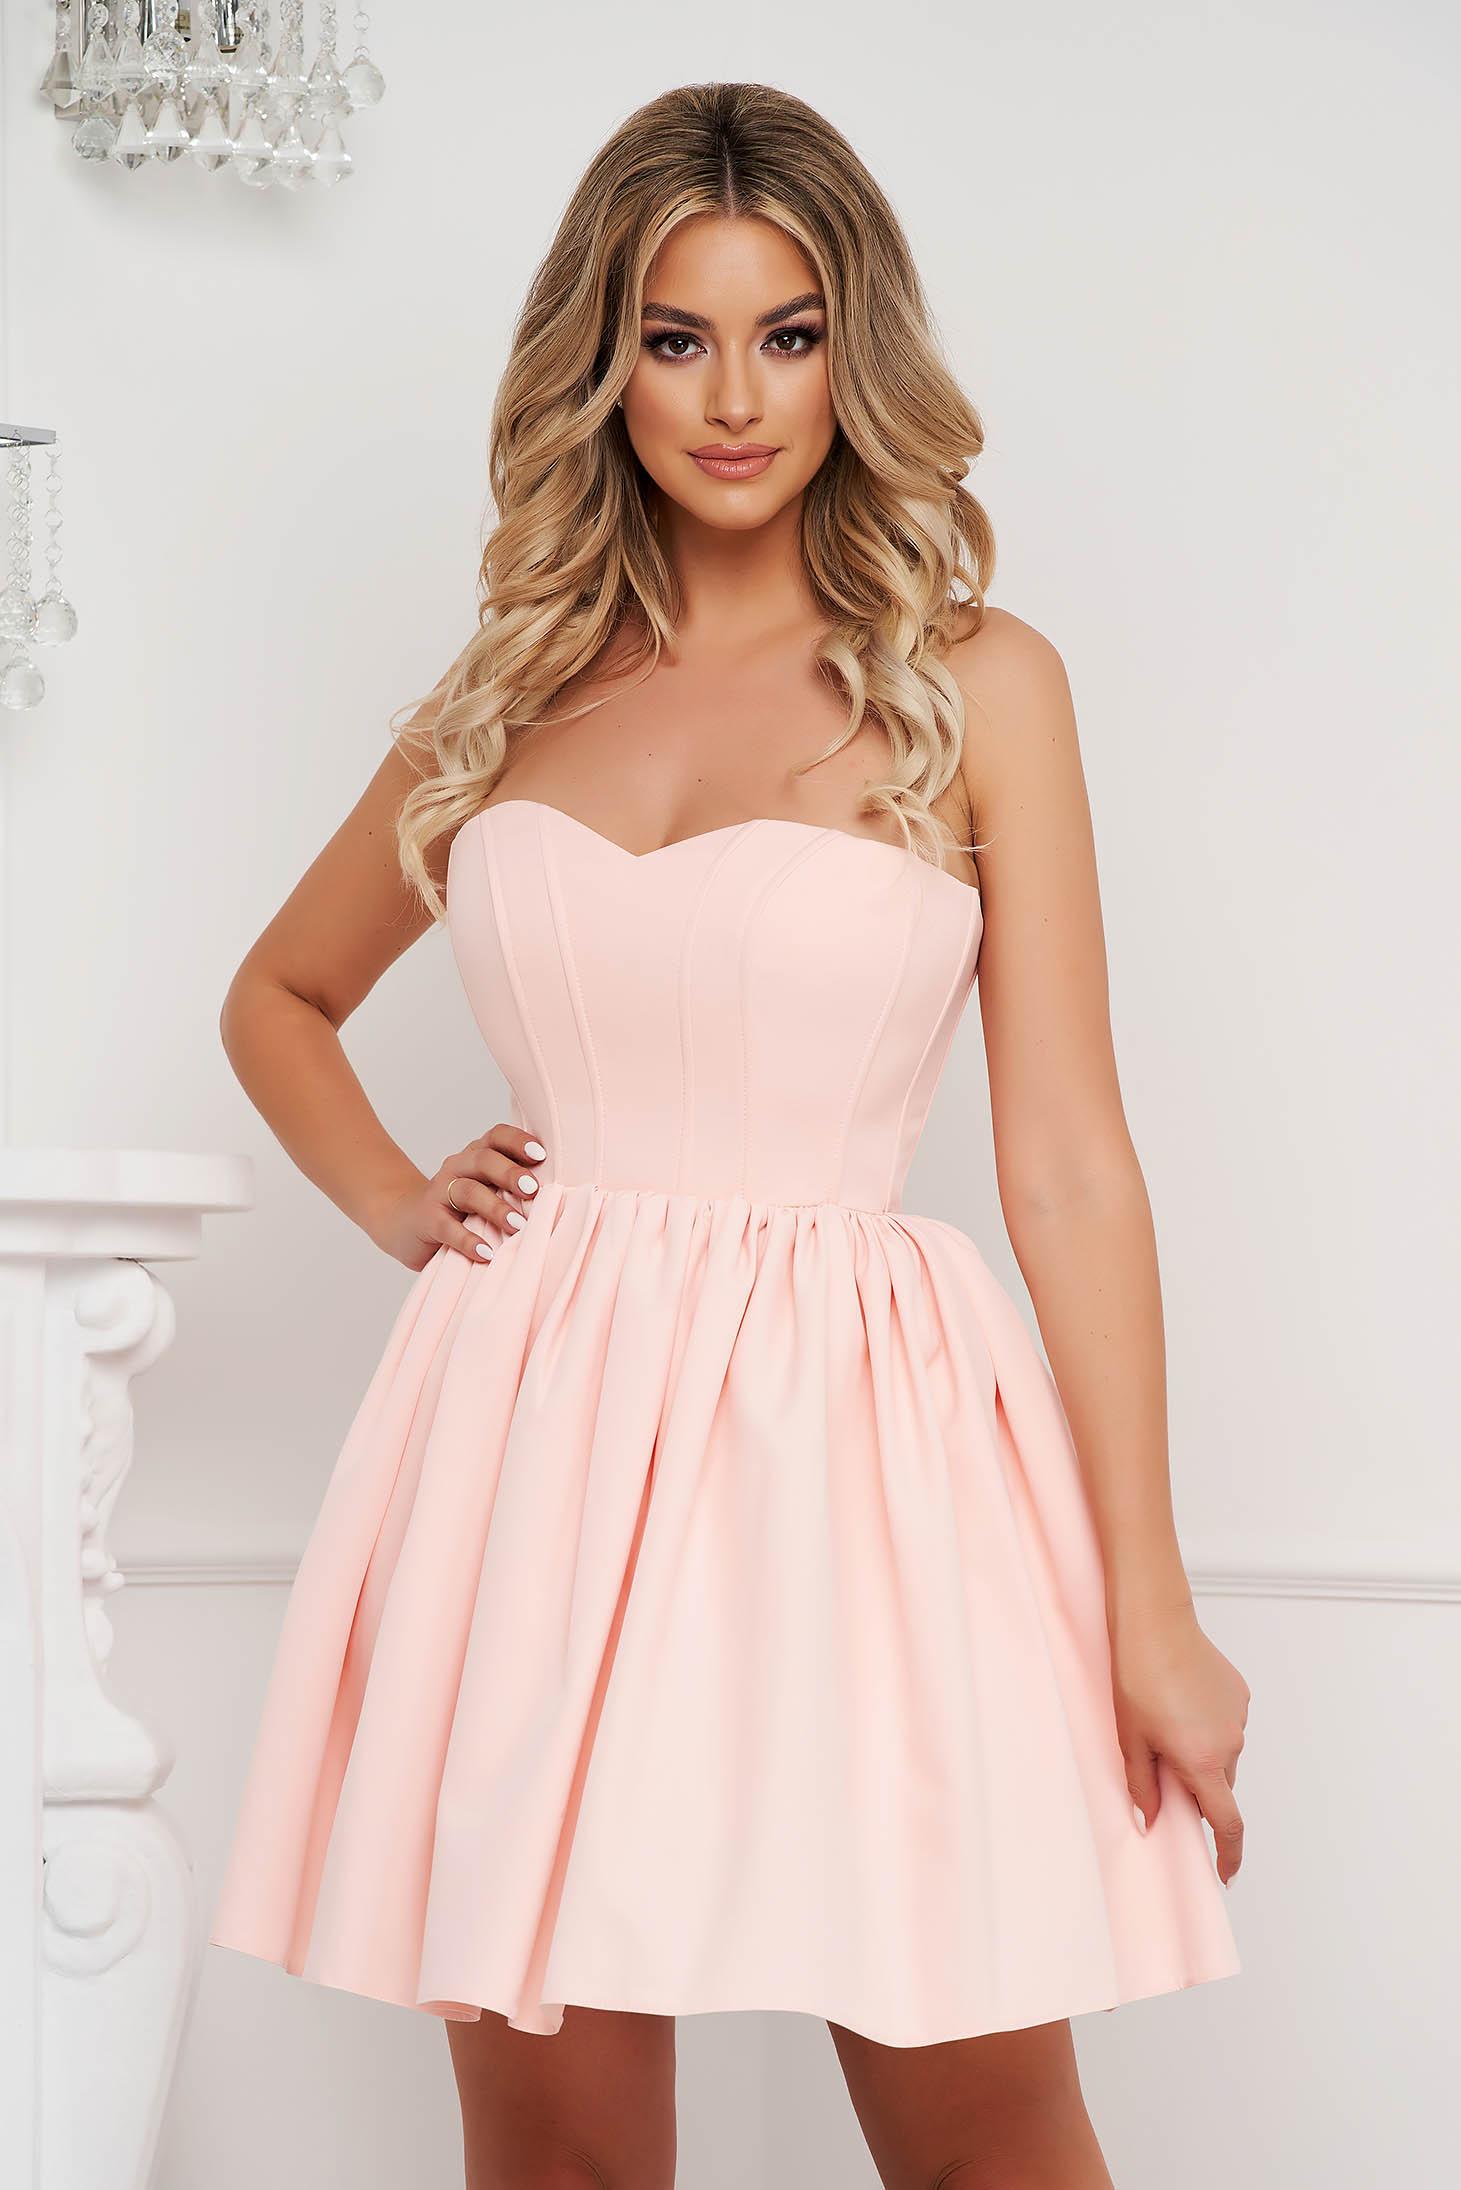 Rochie Lady Pandora roz deschis scurta de ocazie in clos din material subtire tip corset